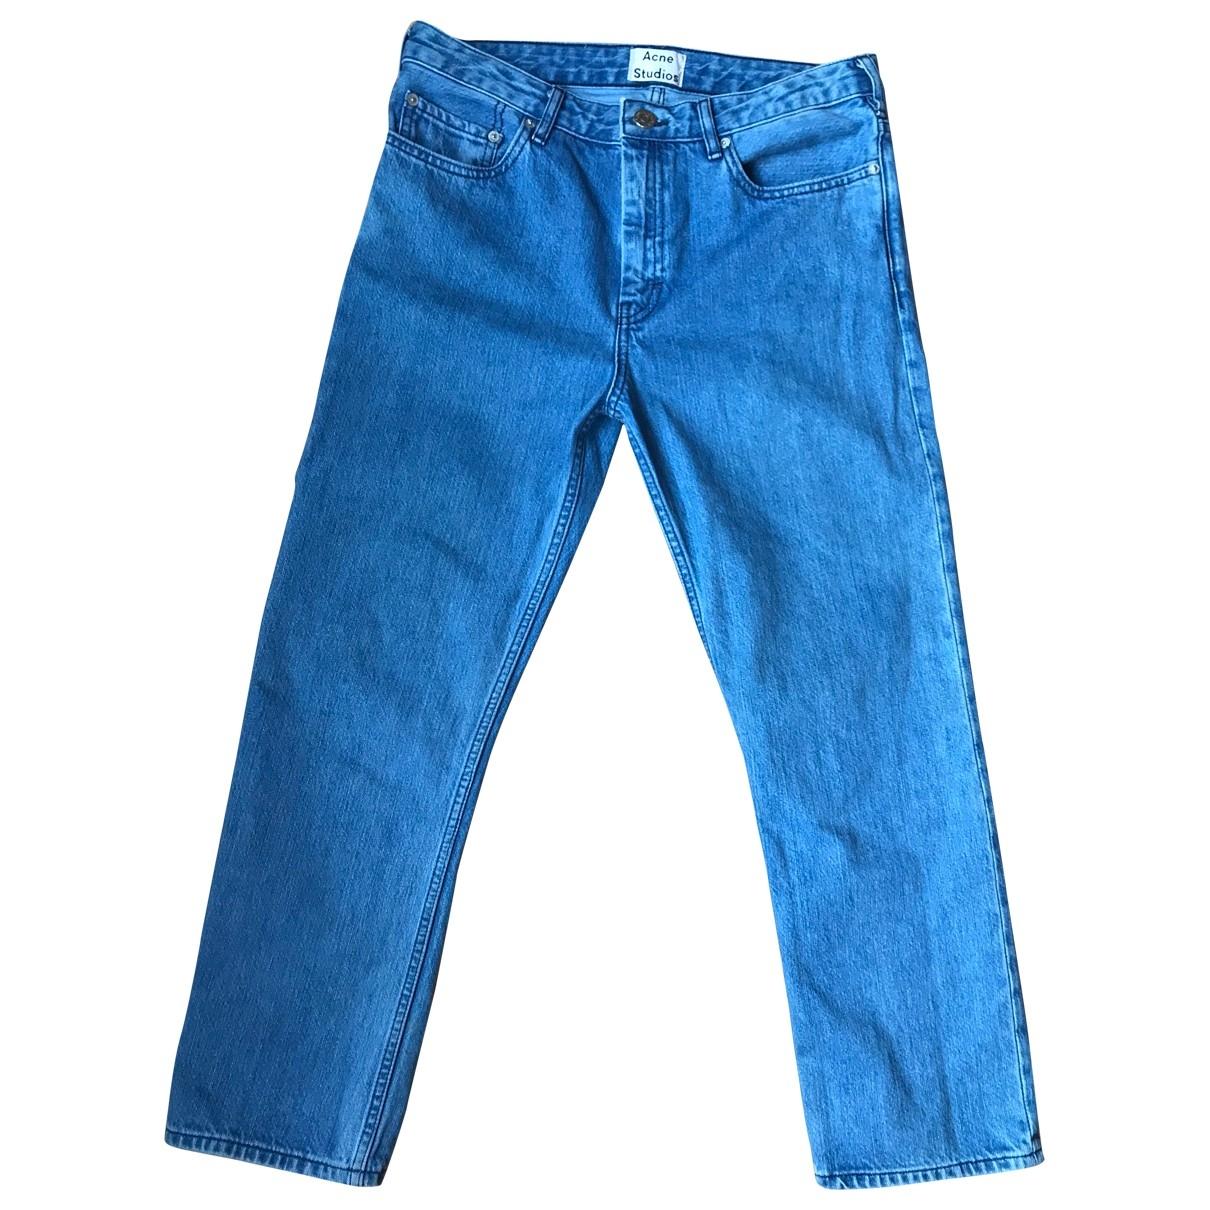 Acne Studios \N Blue Denim - Jeans Trousers for Women 34 FR